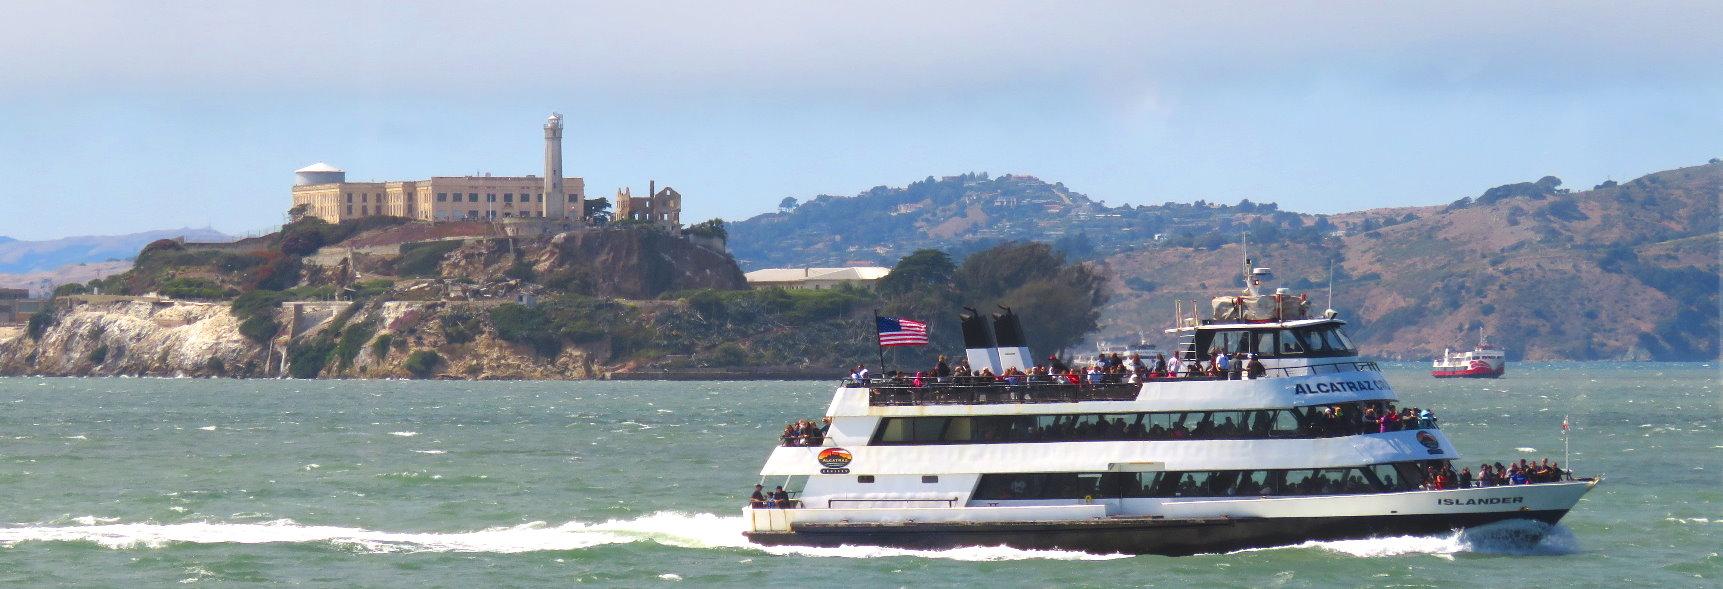 san_francisco_city_tour_and__bay_cruise___ferry_tour